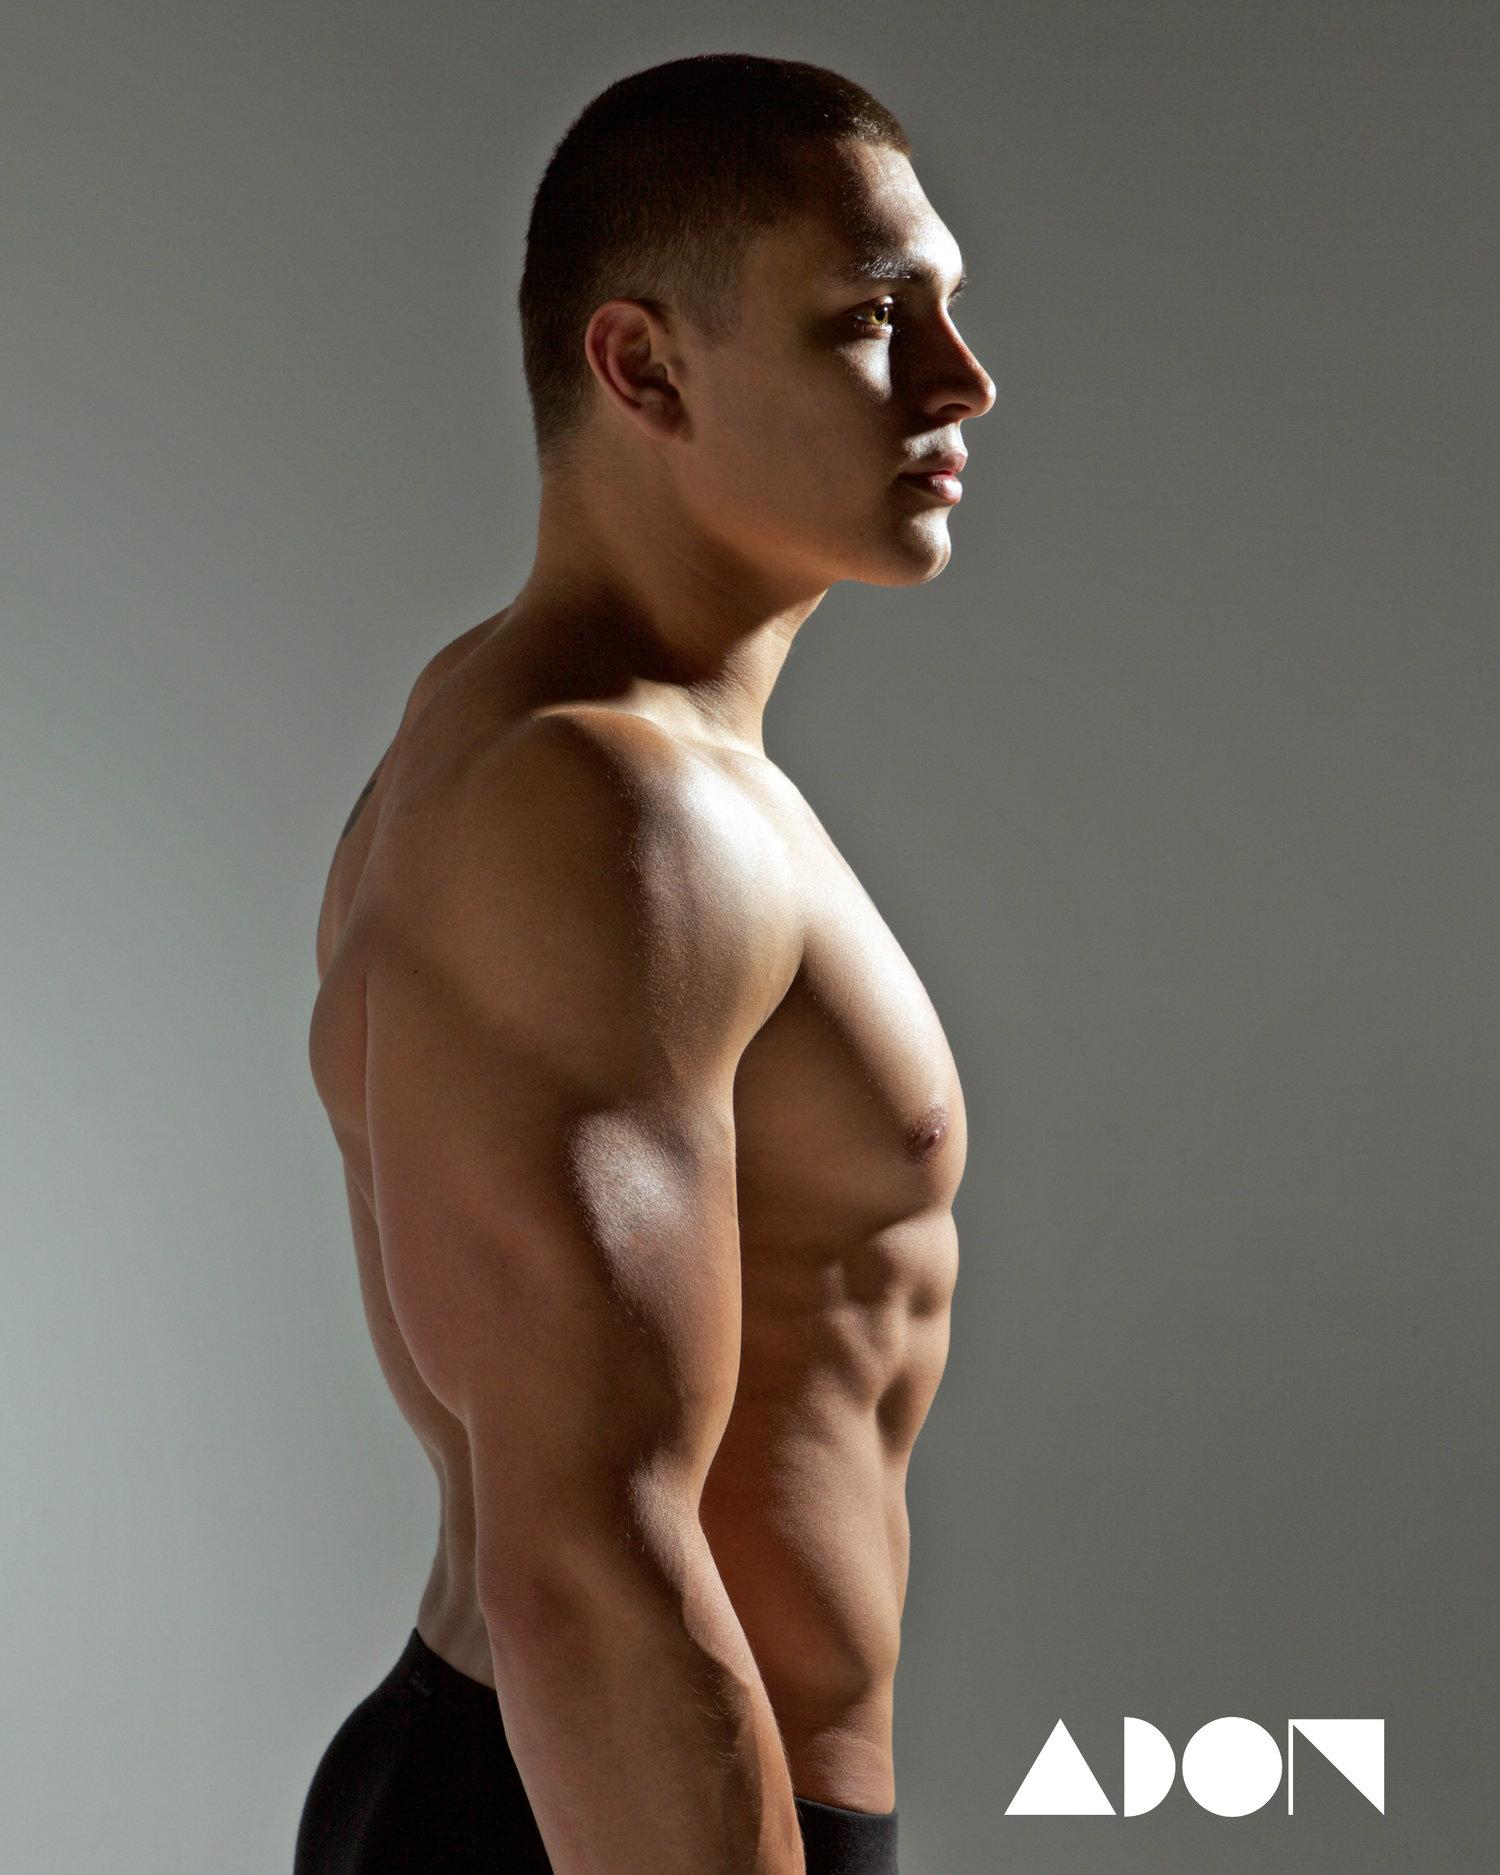 Adon Exclusive: Model Nick Rodriguez By Stefan mreczko